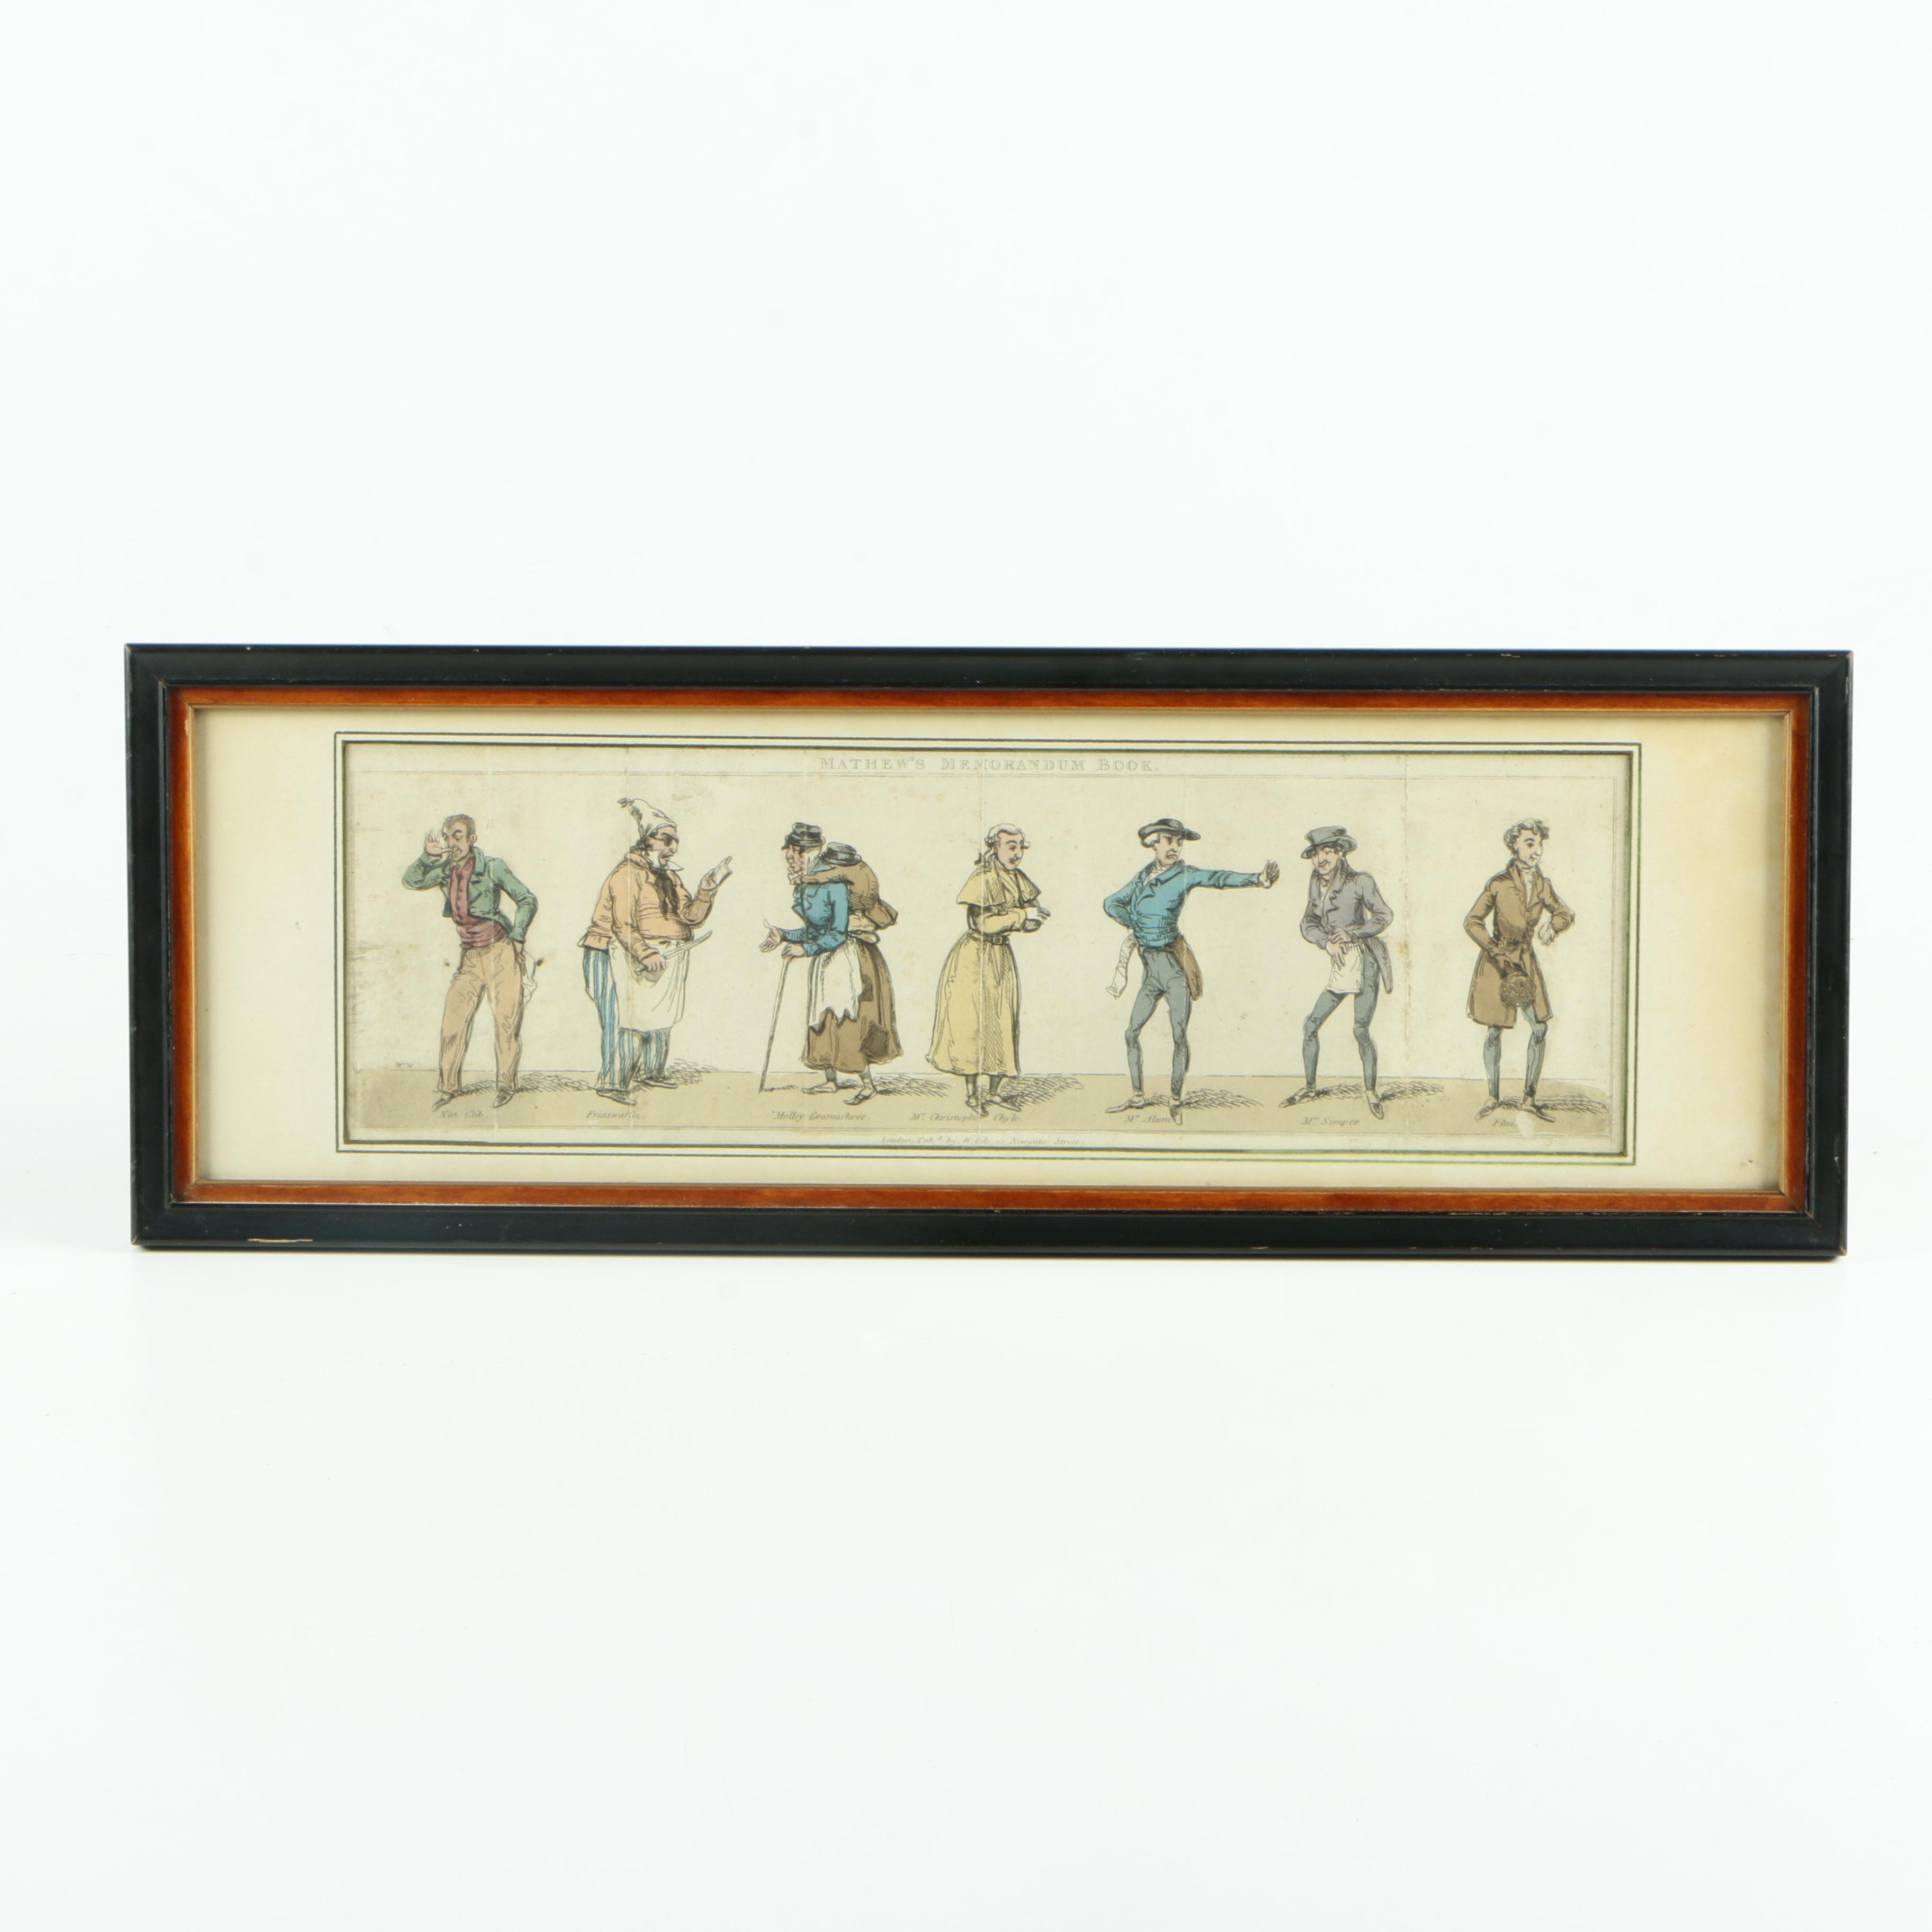 Hand-colored Wood Etching from Mathew's Memorandum Book